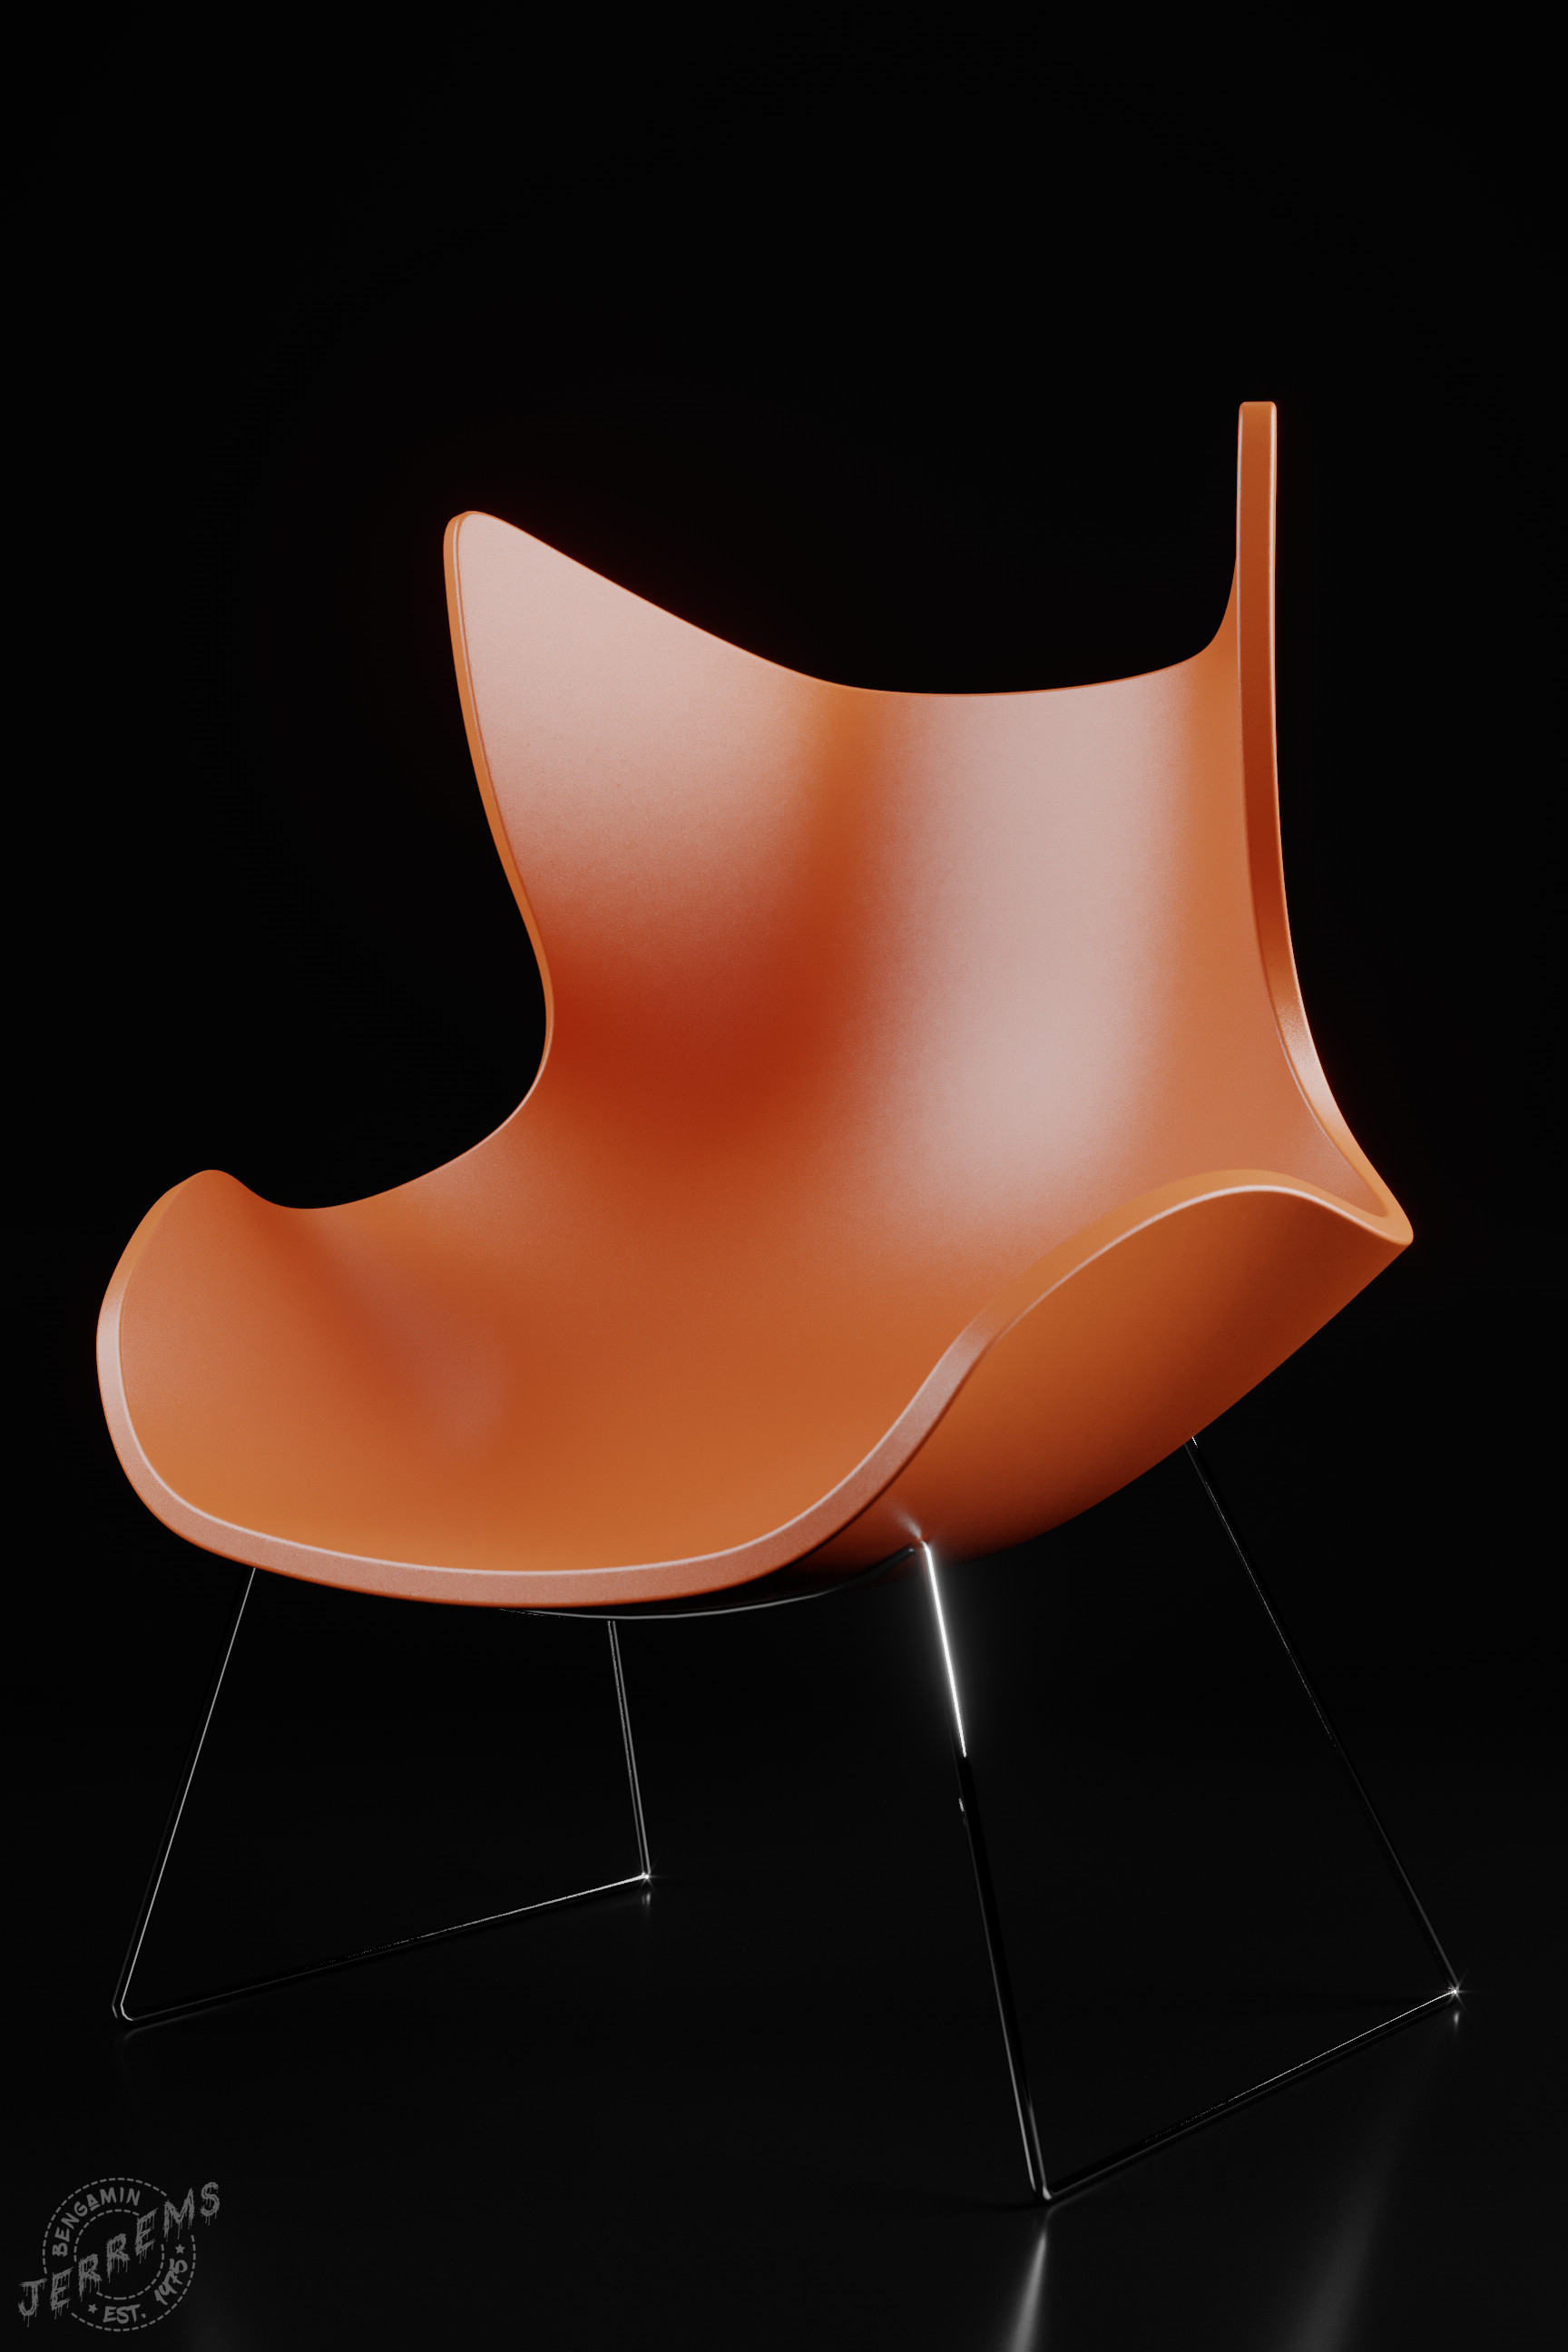 ArtStation Retro Highback Plastic Chair Bengamin Jerrems